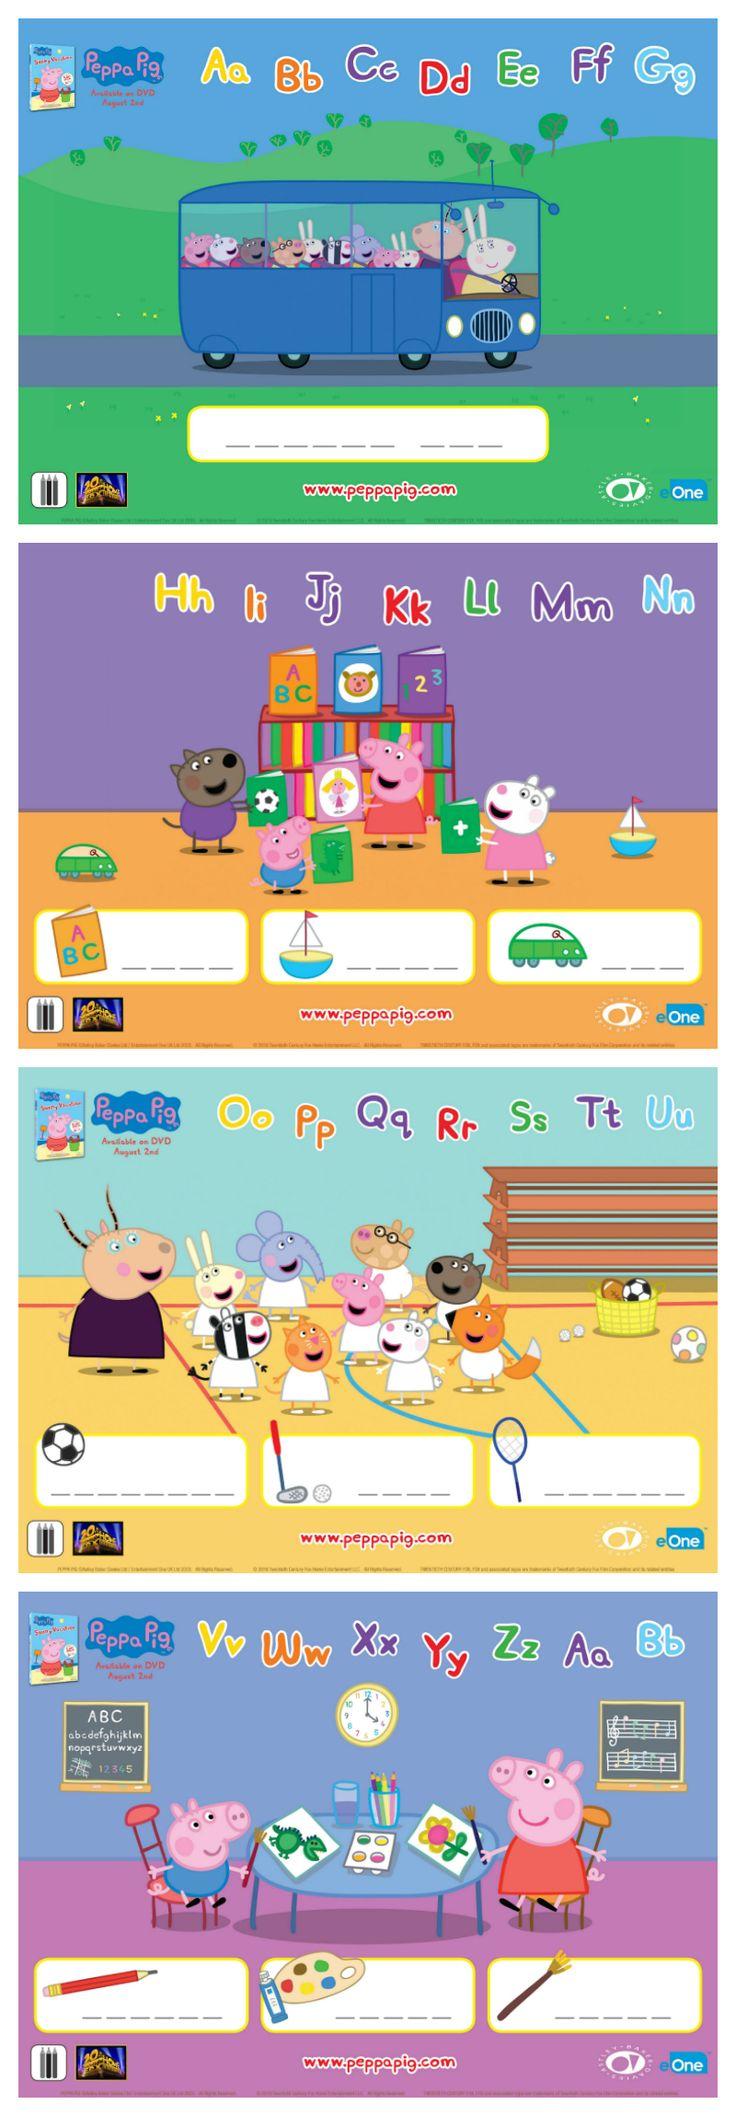 Free Peppa Pig Printable Word Puzzles